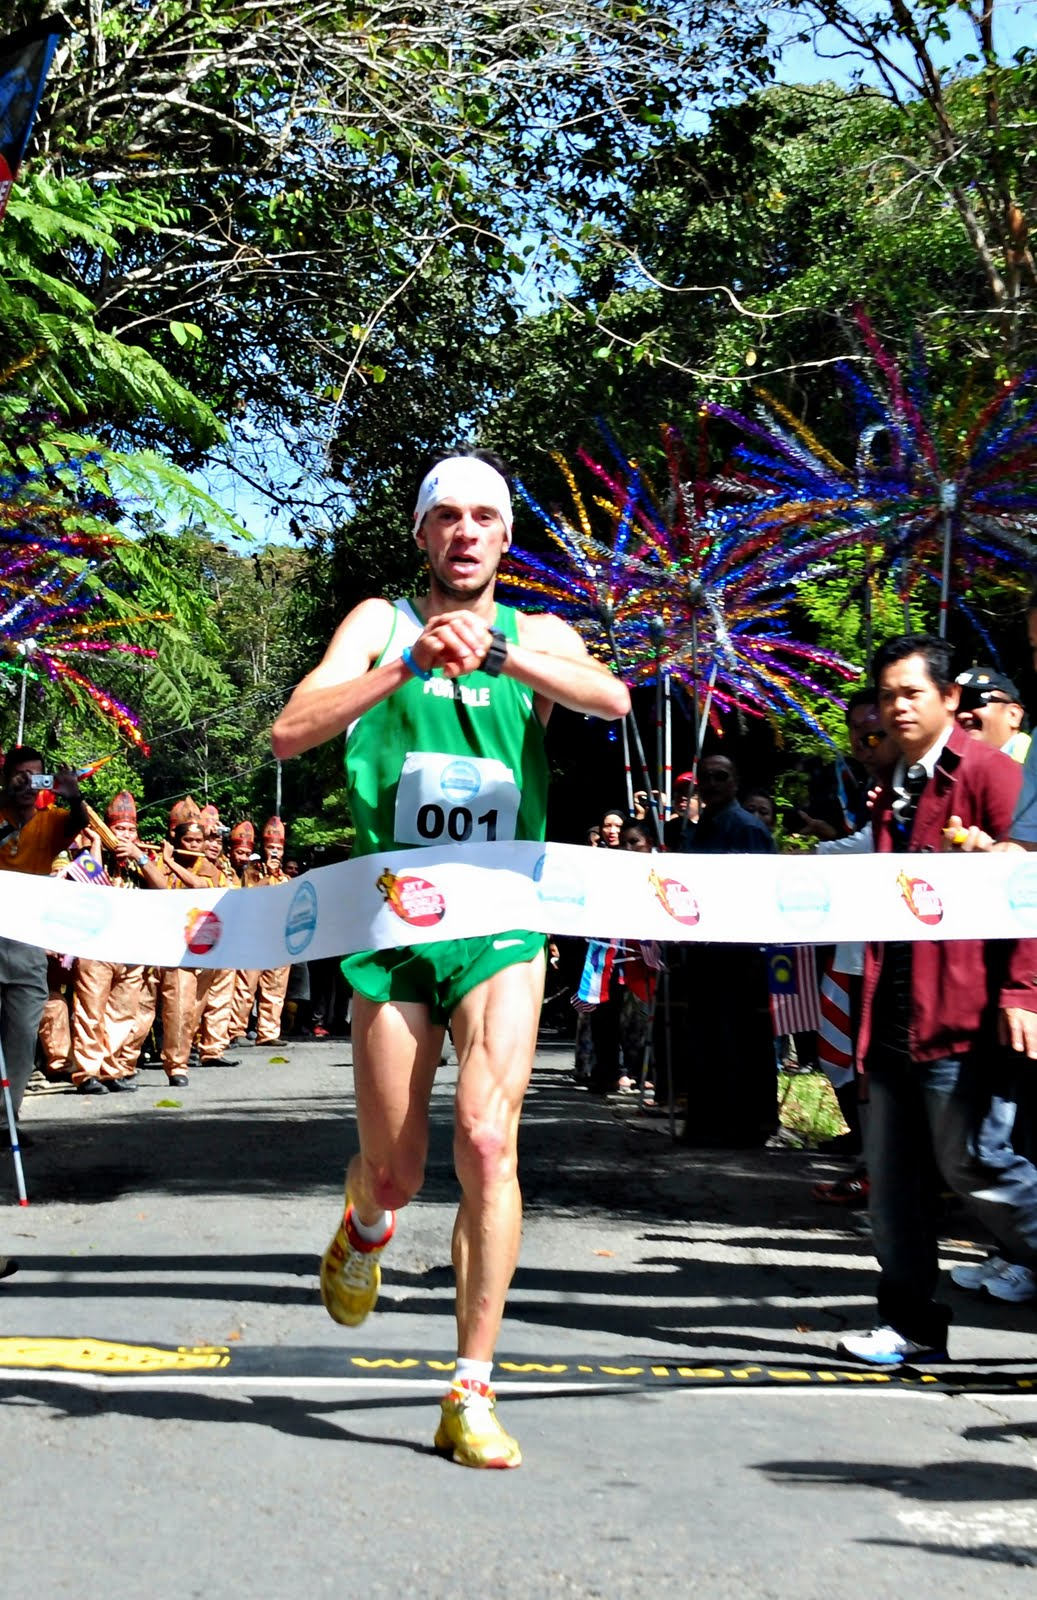 Marco de Gasperi - držitel rekordu tratě